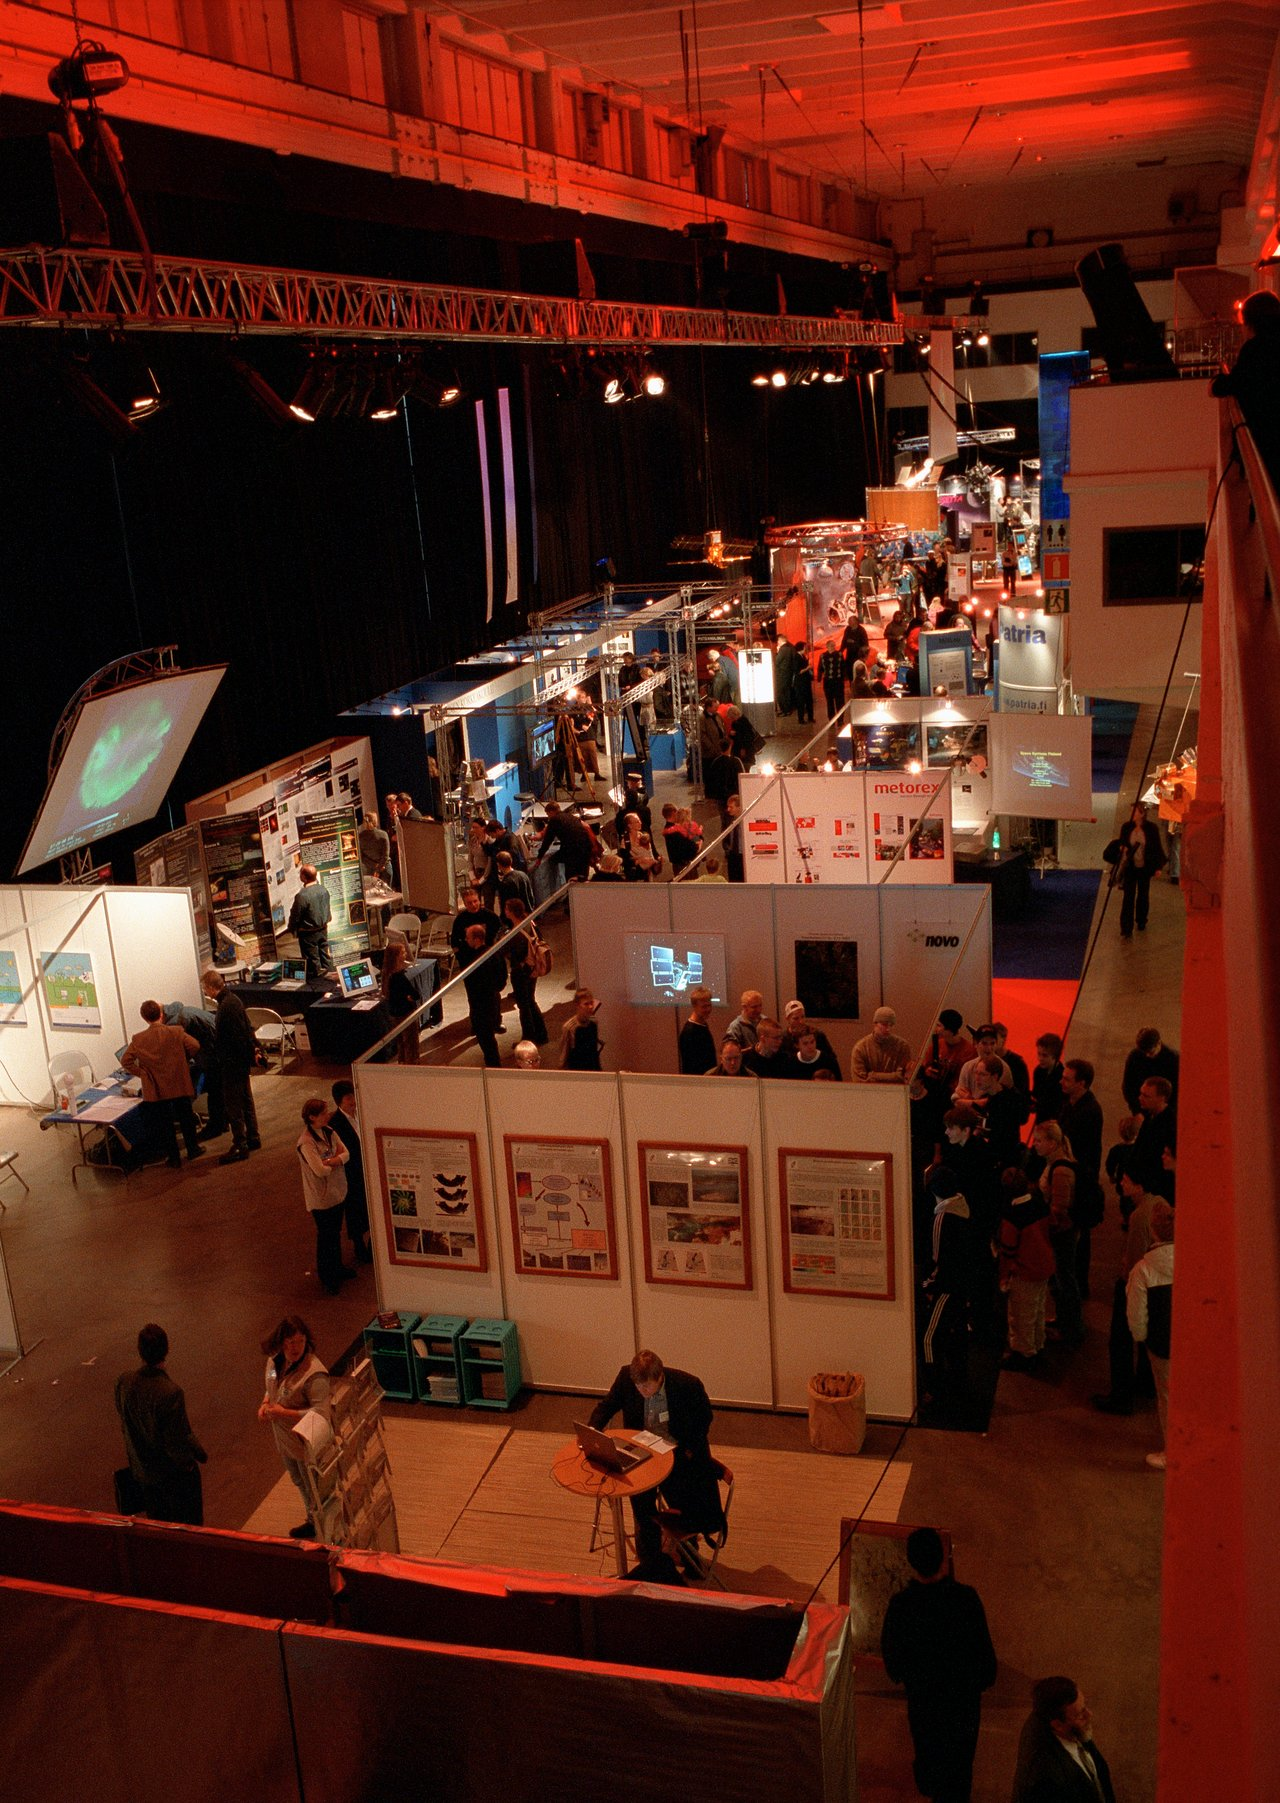 Helsinki Space Exhibition 2003